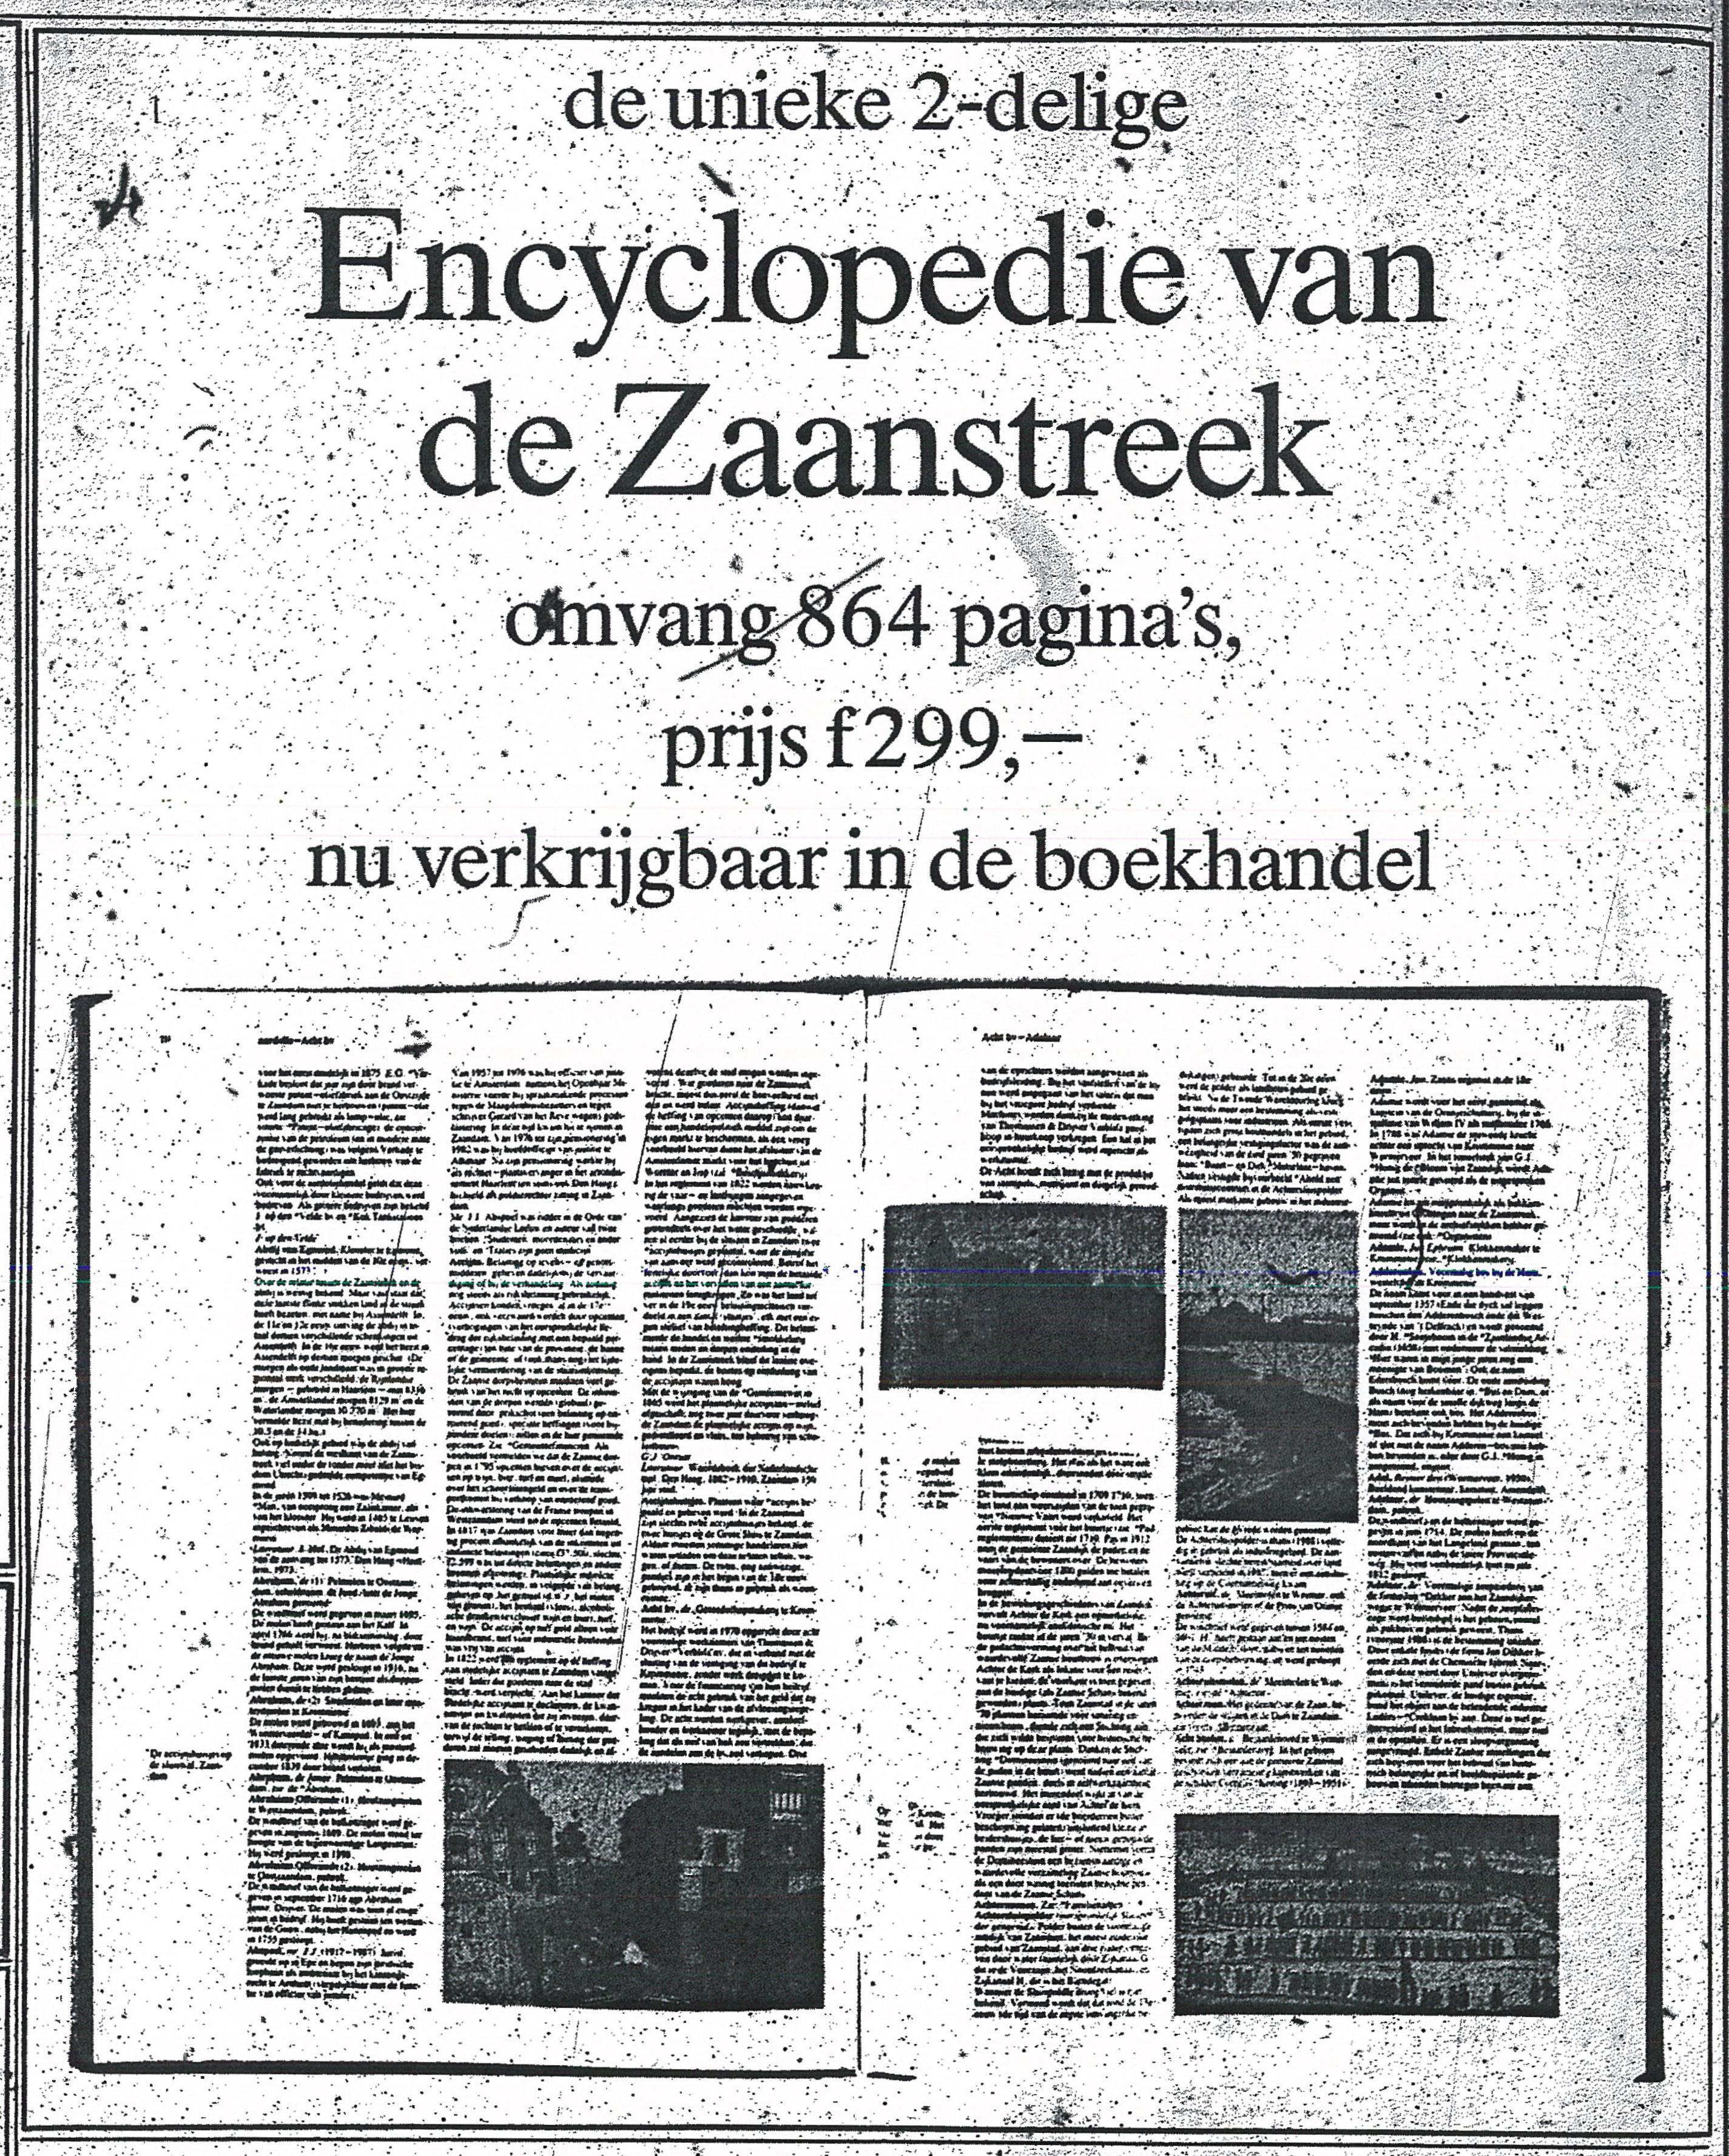 Advertentie Encyclopedie (De Typhoon, 26-10-1991)